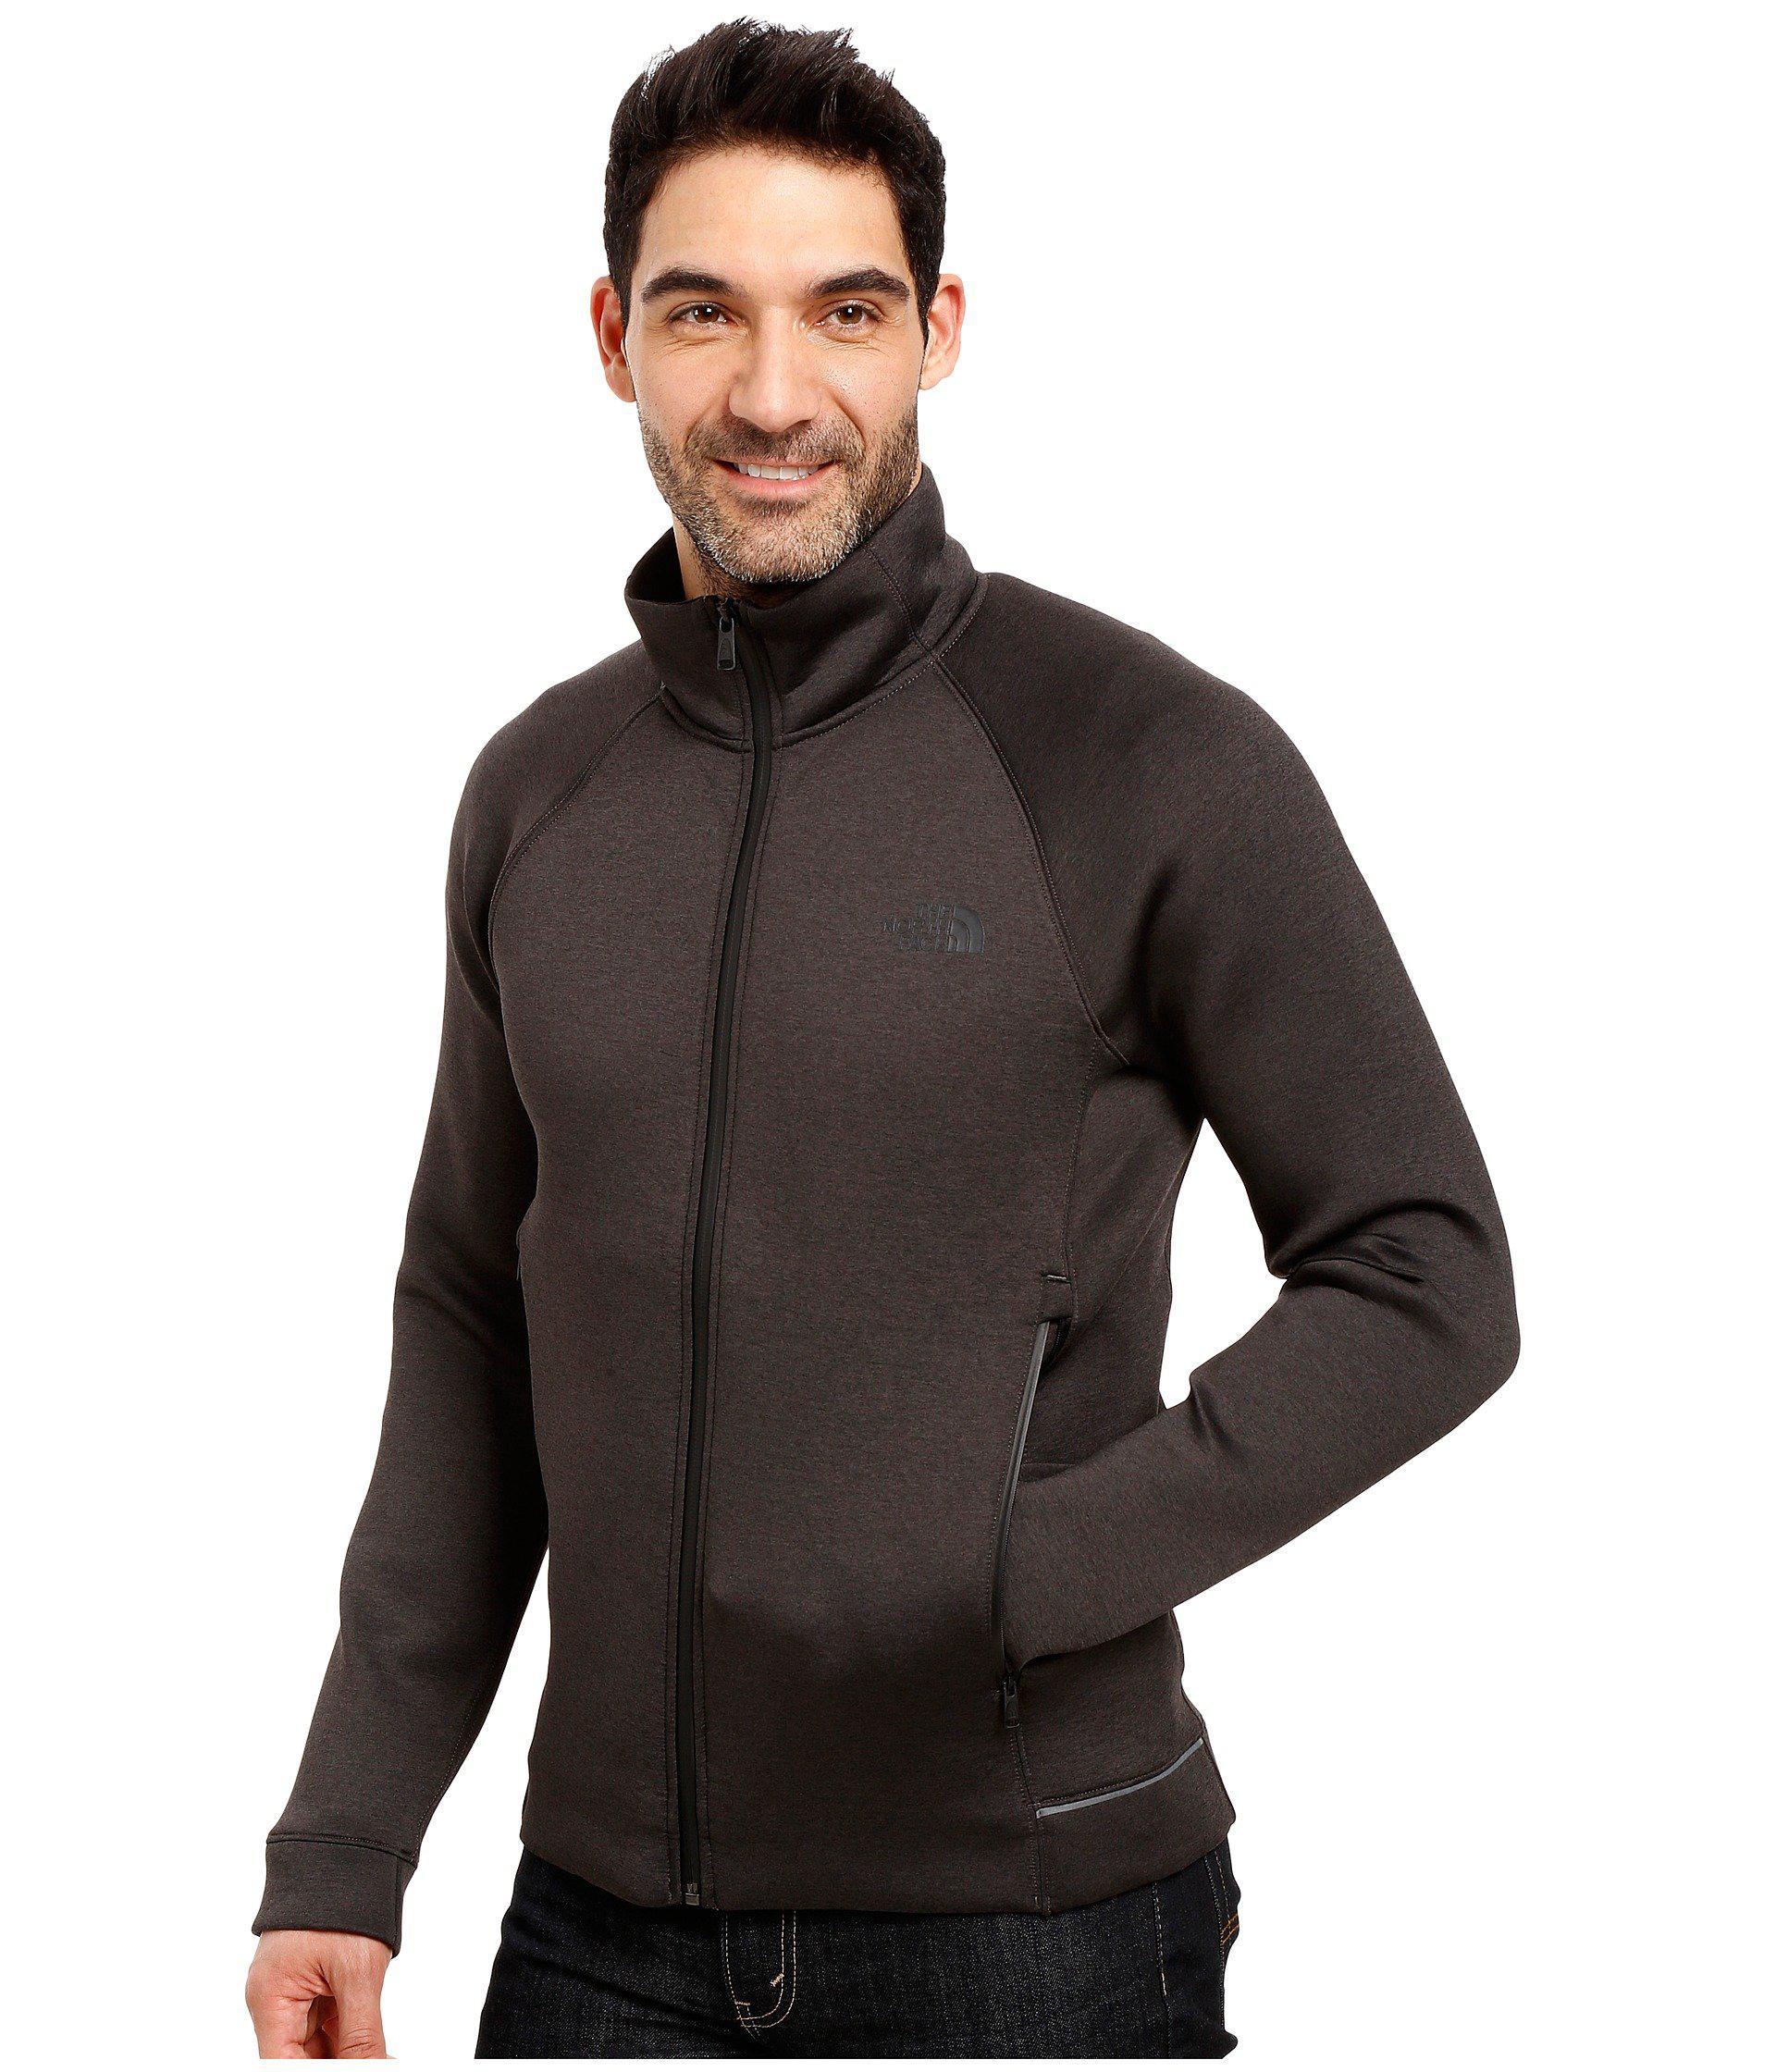 north face apex bionic jacket asphalt grey heather wall rh takeoutburger com